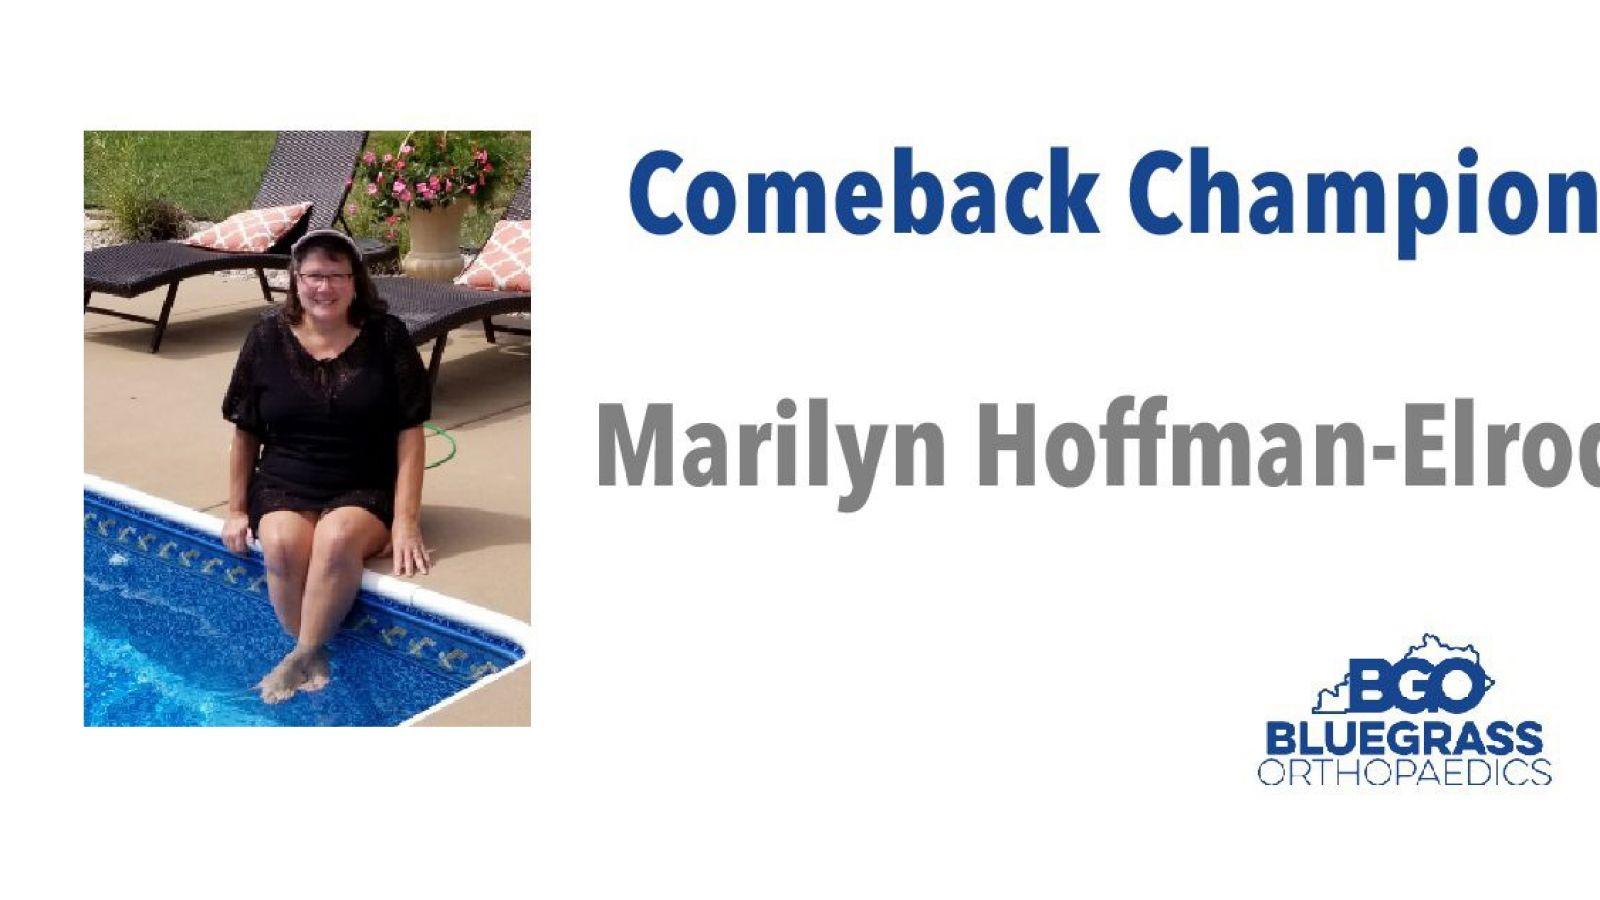 Marilyn Hoffman-Elrod:  Comeback Champion